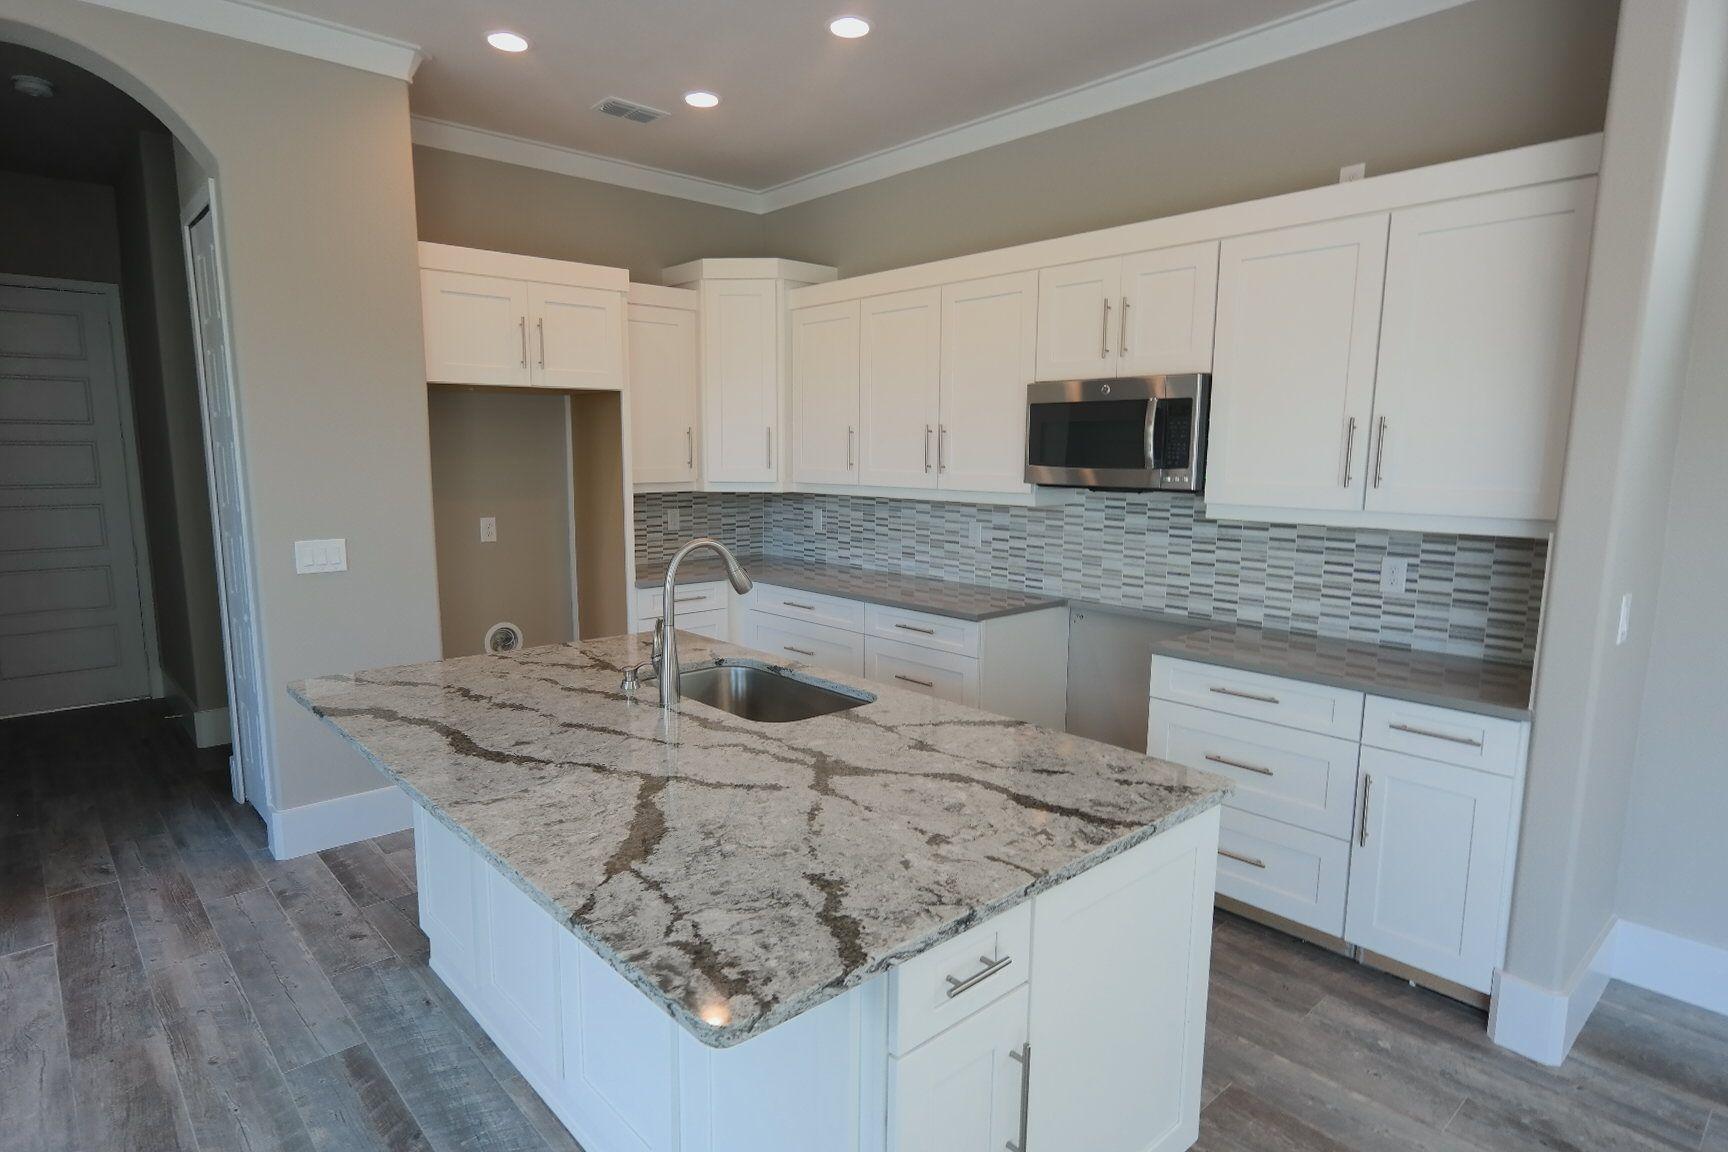 Skobel Homes In Gainesville Fl Diy Kitchen Countertops Kitchen Countertops Redo Kitchen Counter Tops